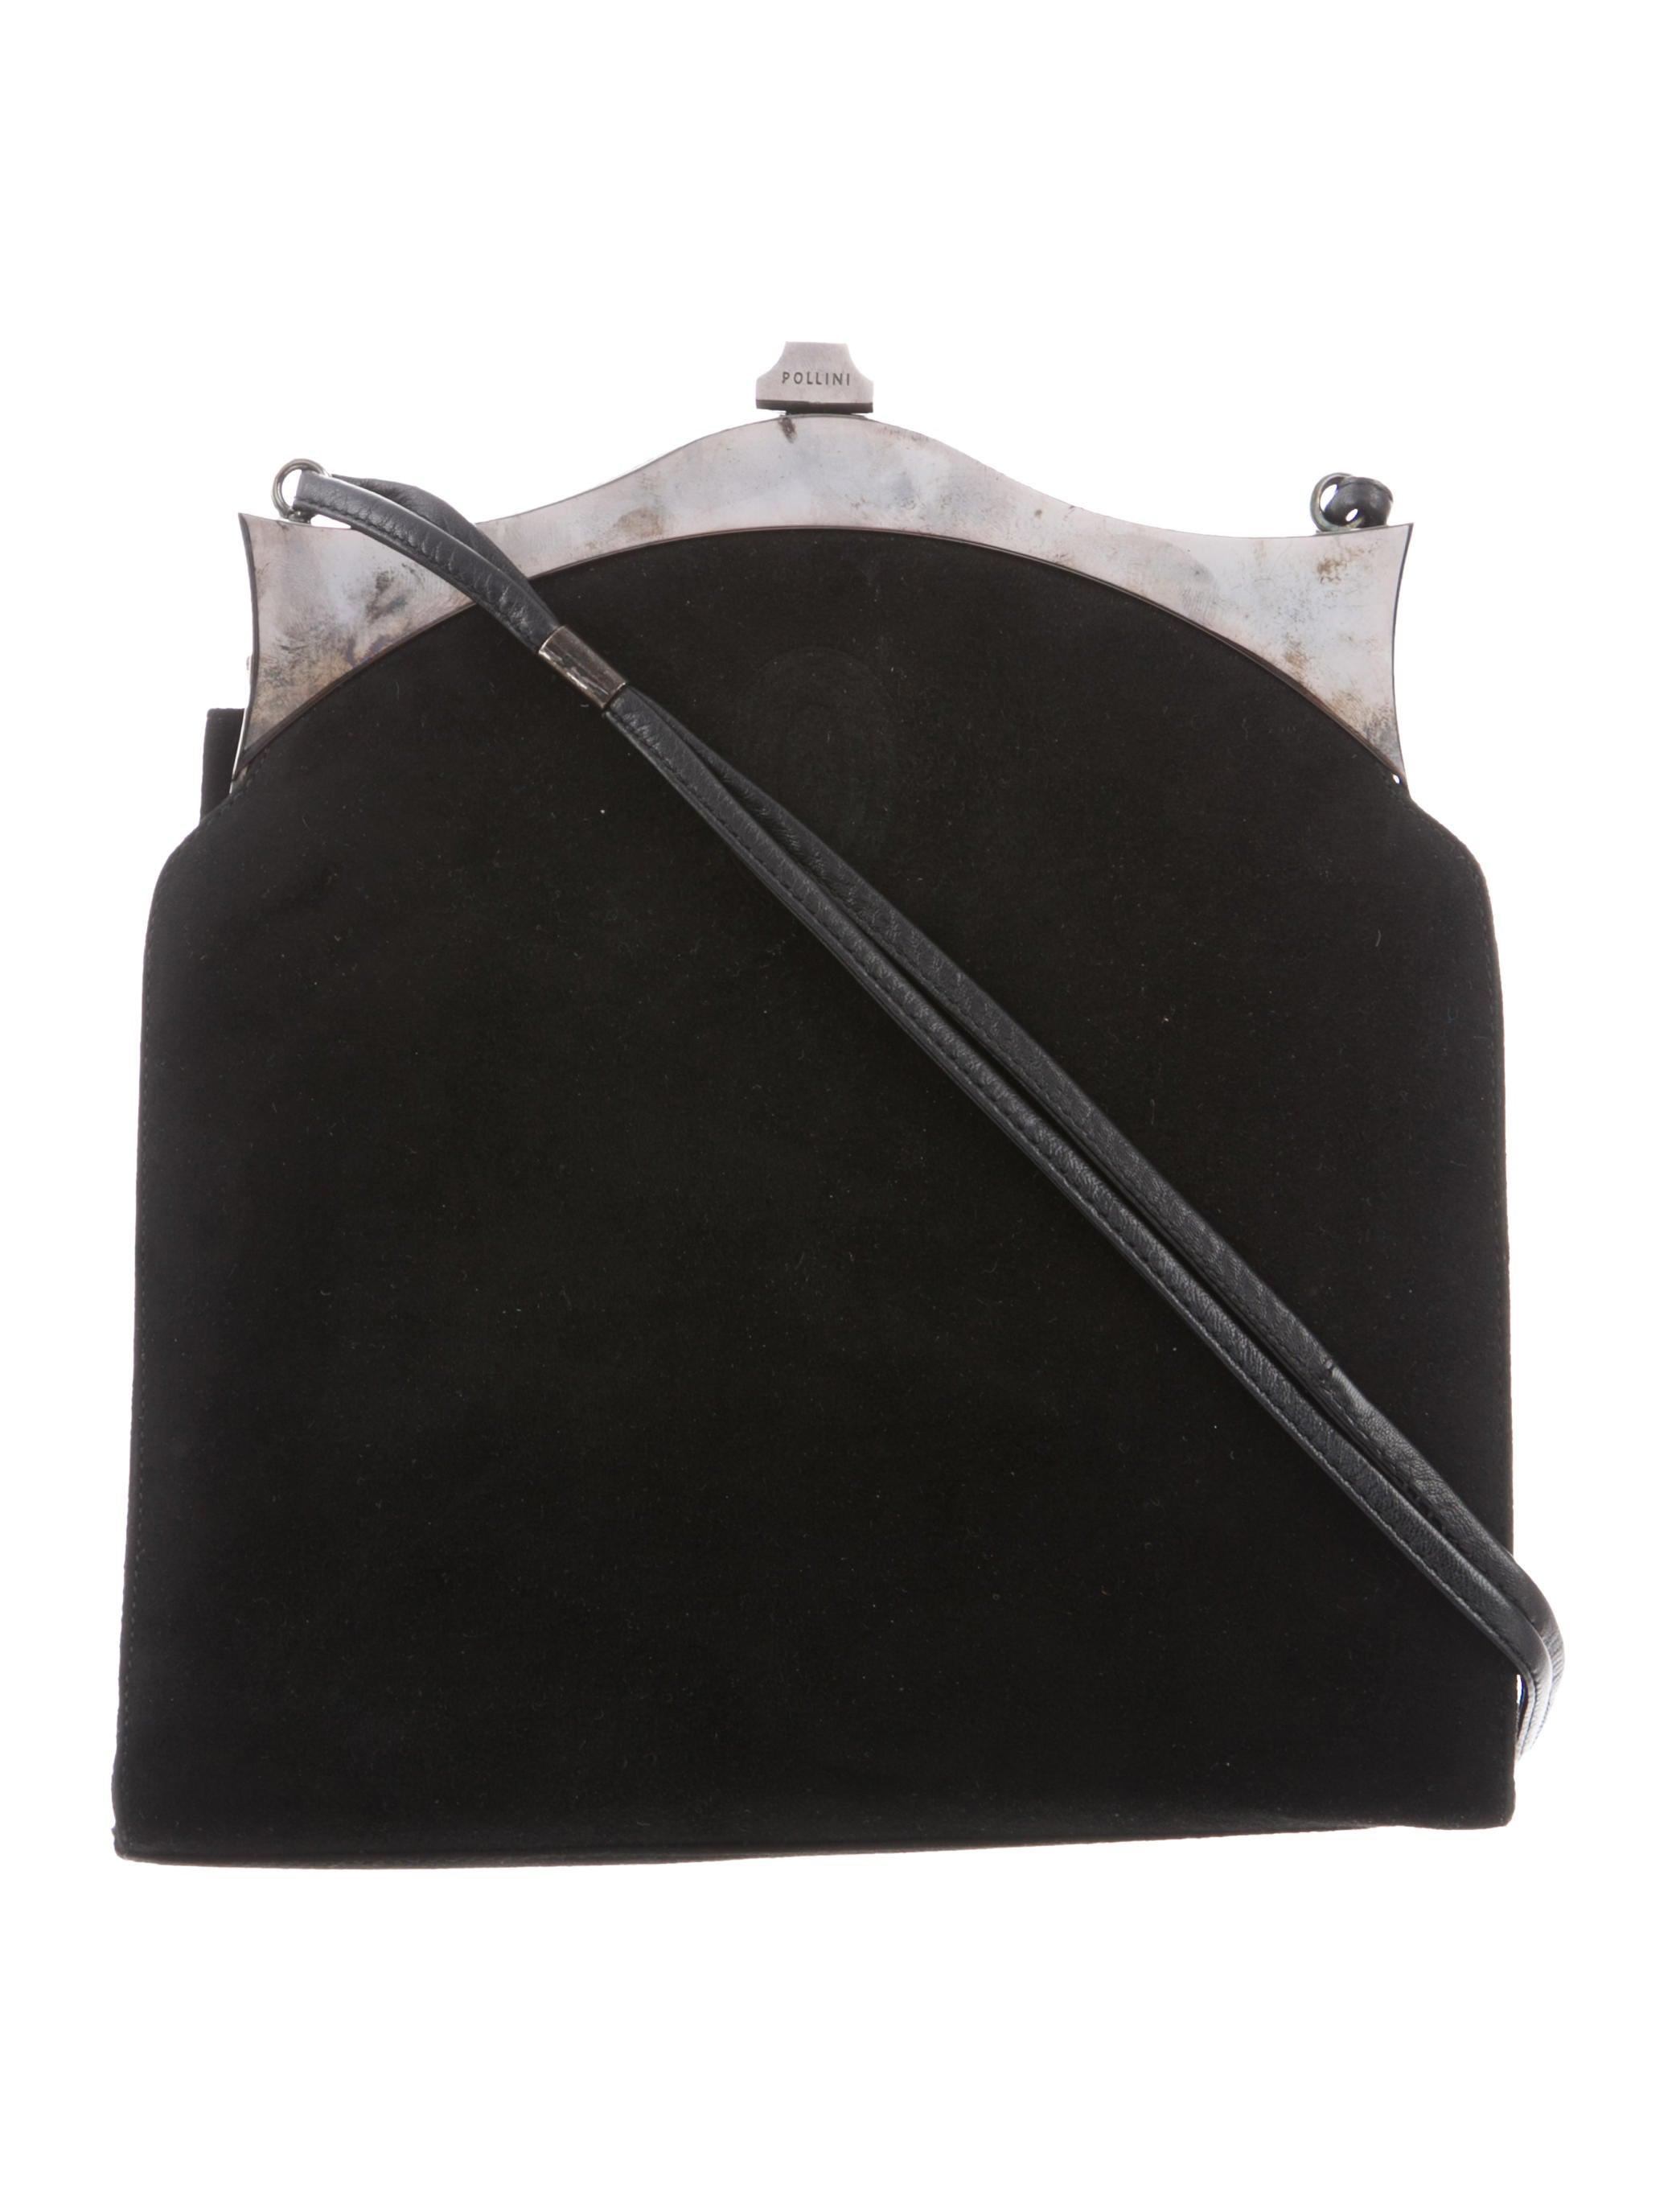 95ef5ebc17 Pollini Suede Frame Bag - Handbags - POL20562